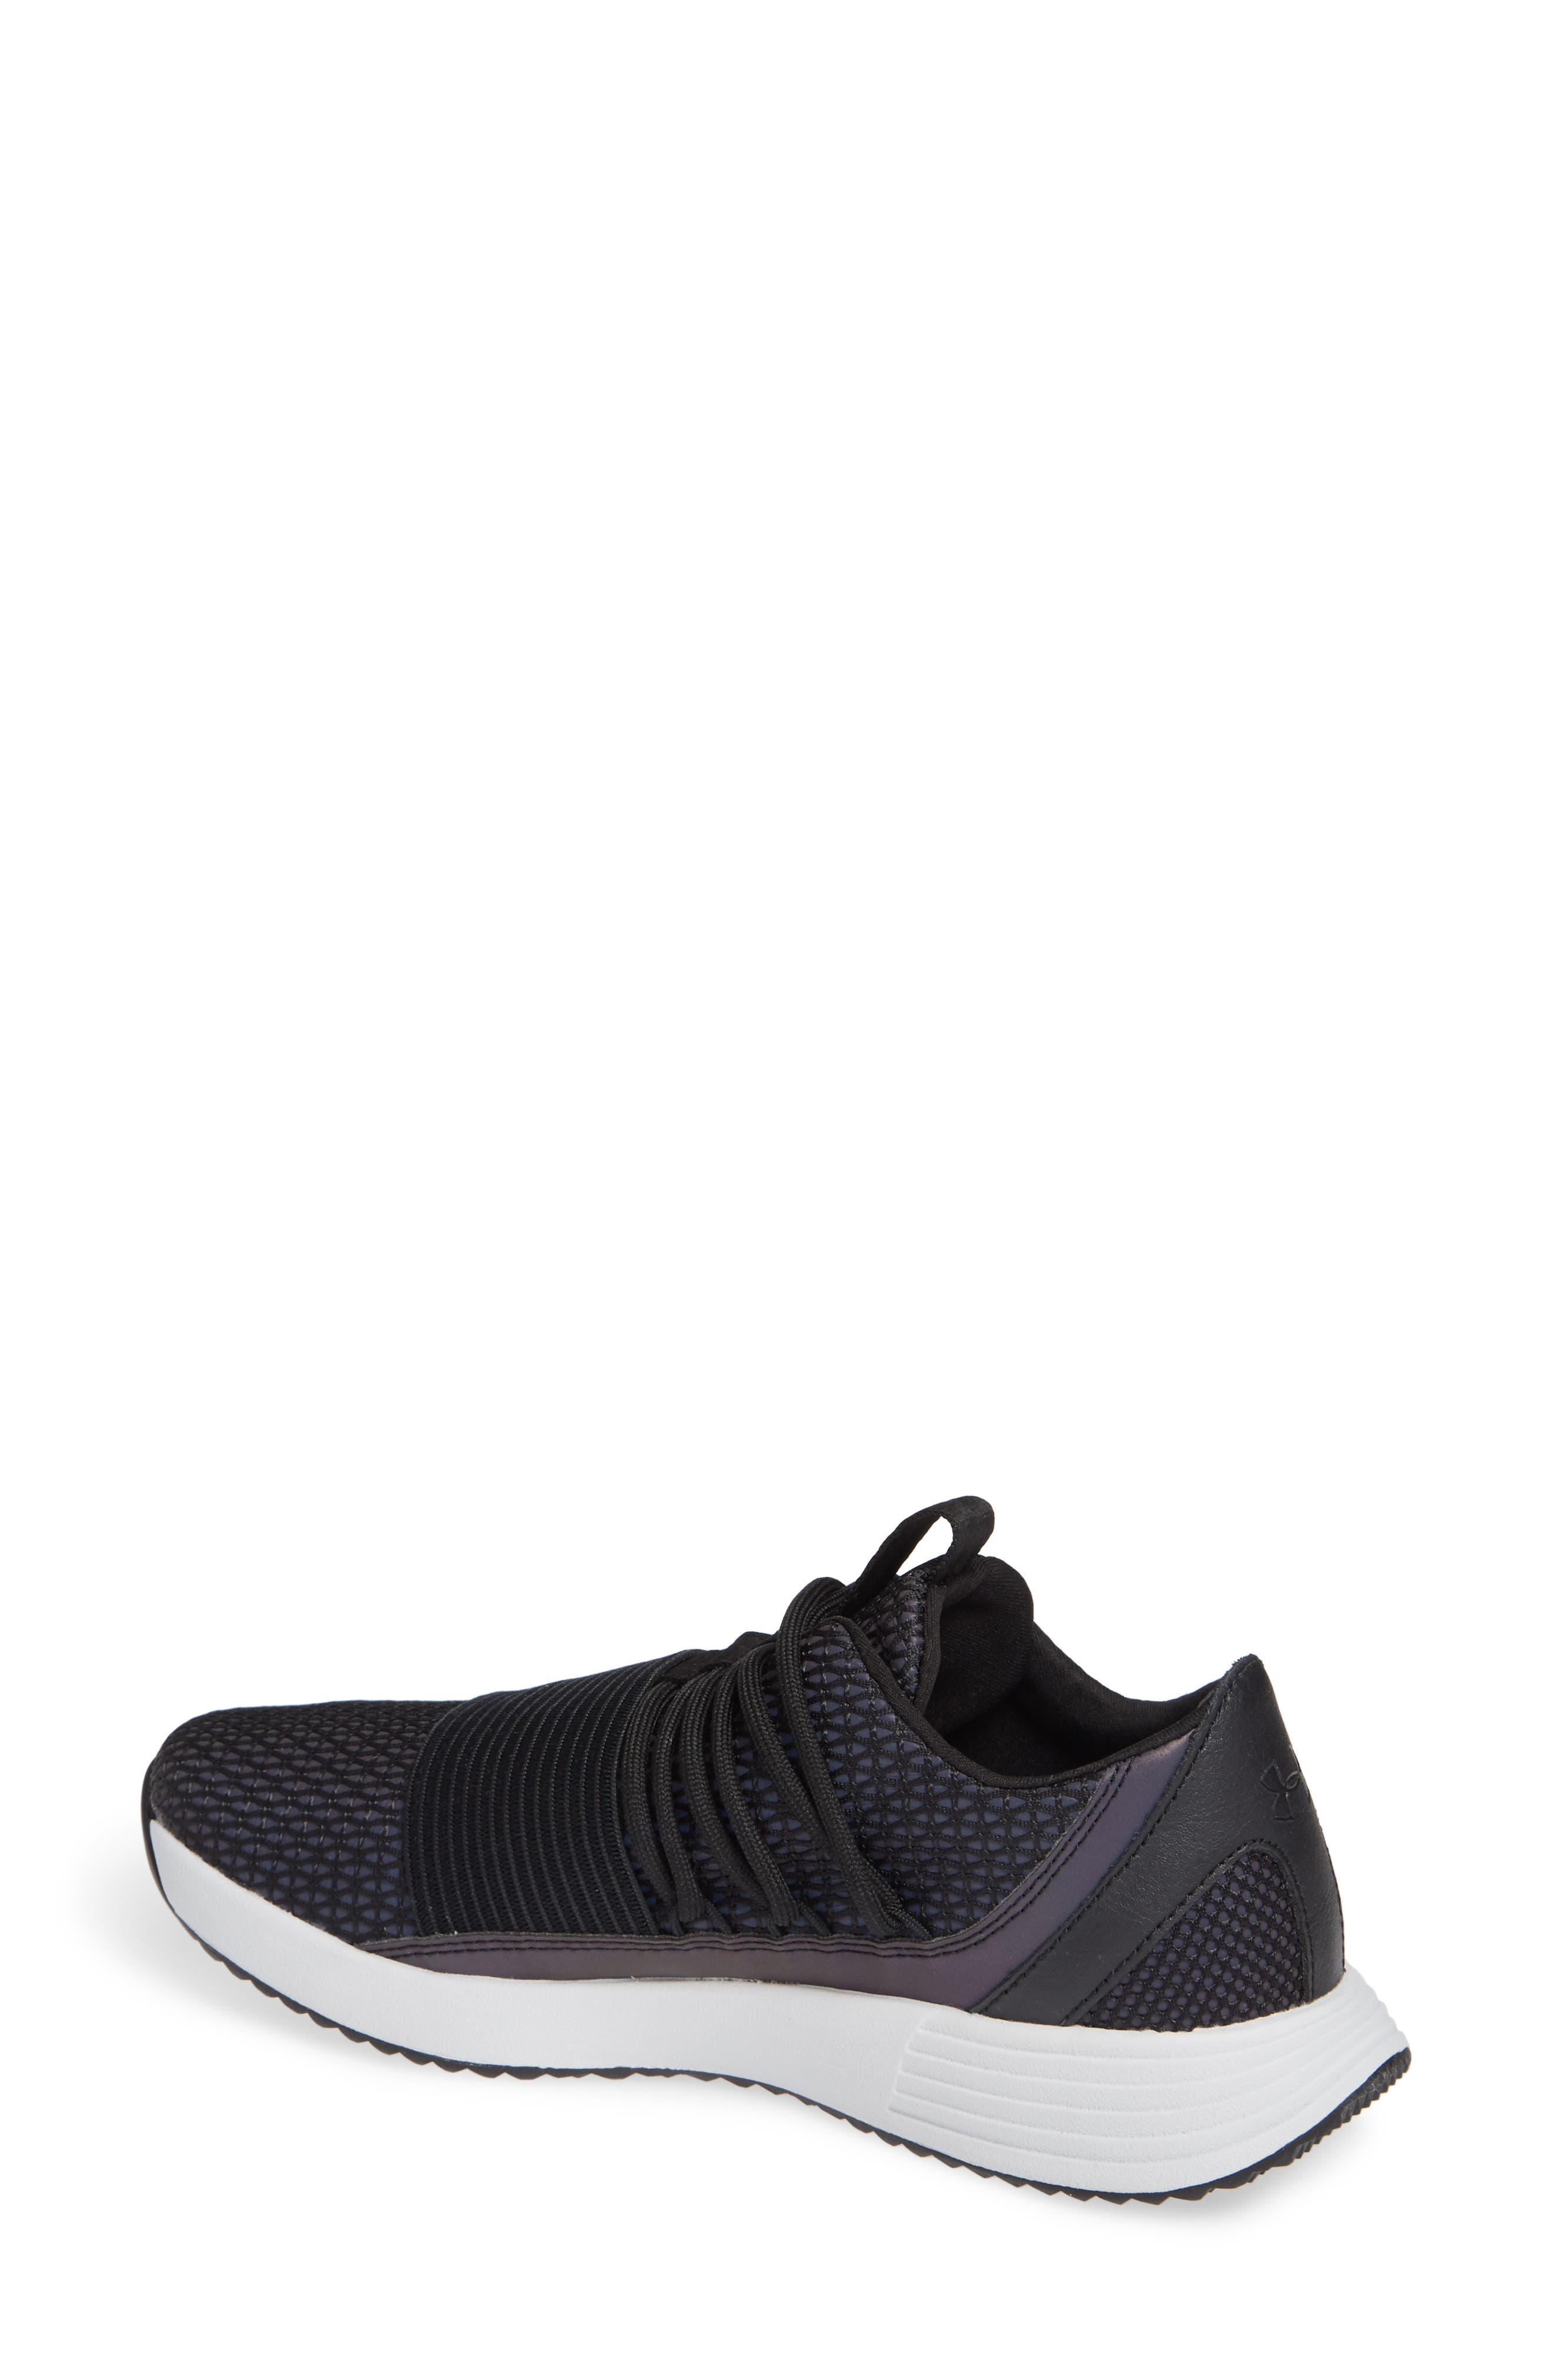 Breathe Reflective Low Top Sneaker,                             Alternate thumbnail 2, color,                             BLACK/ BLACK/ BLACK